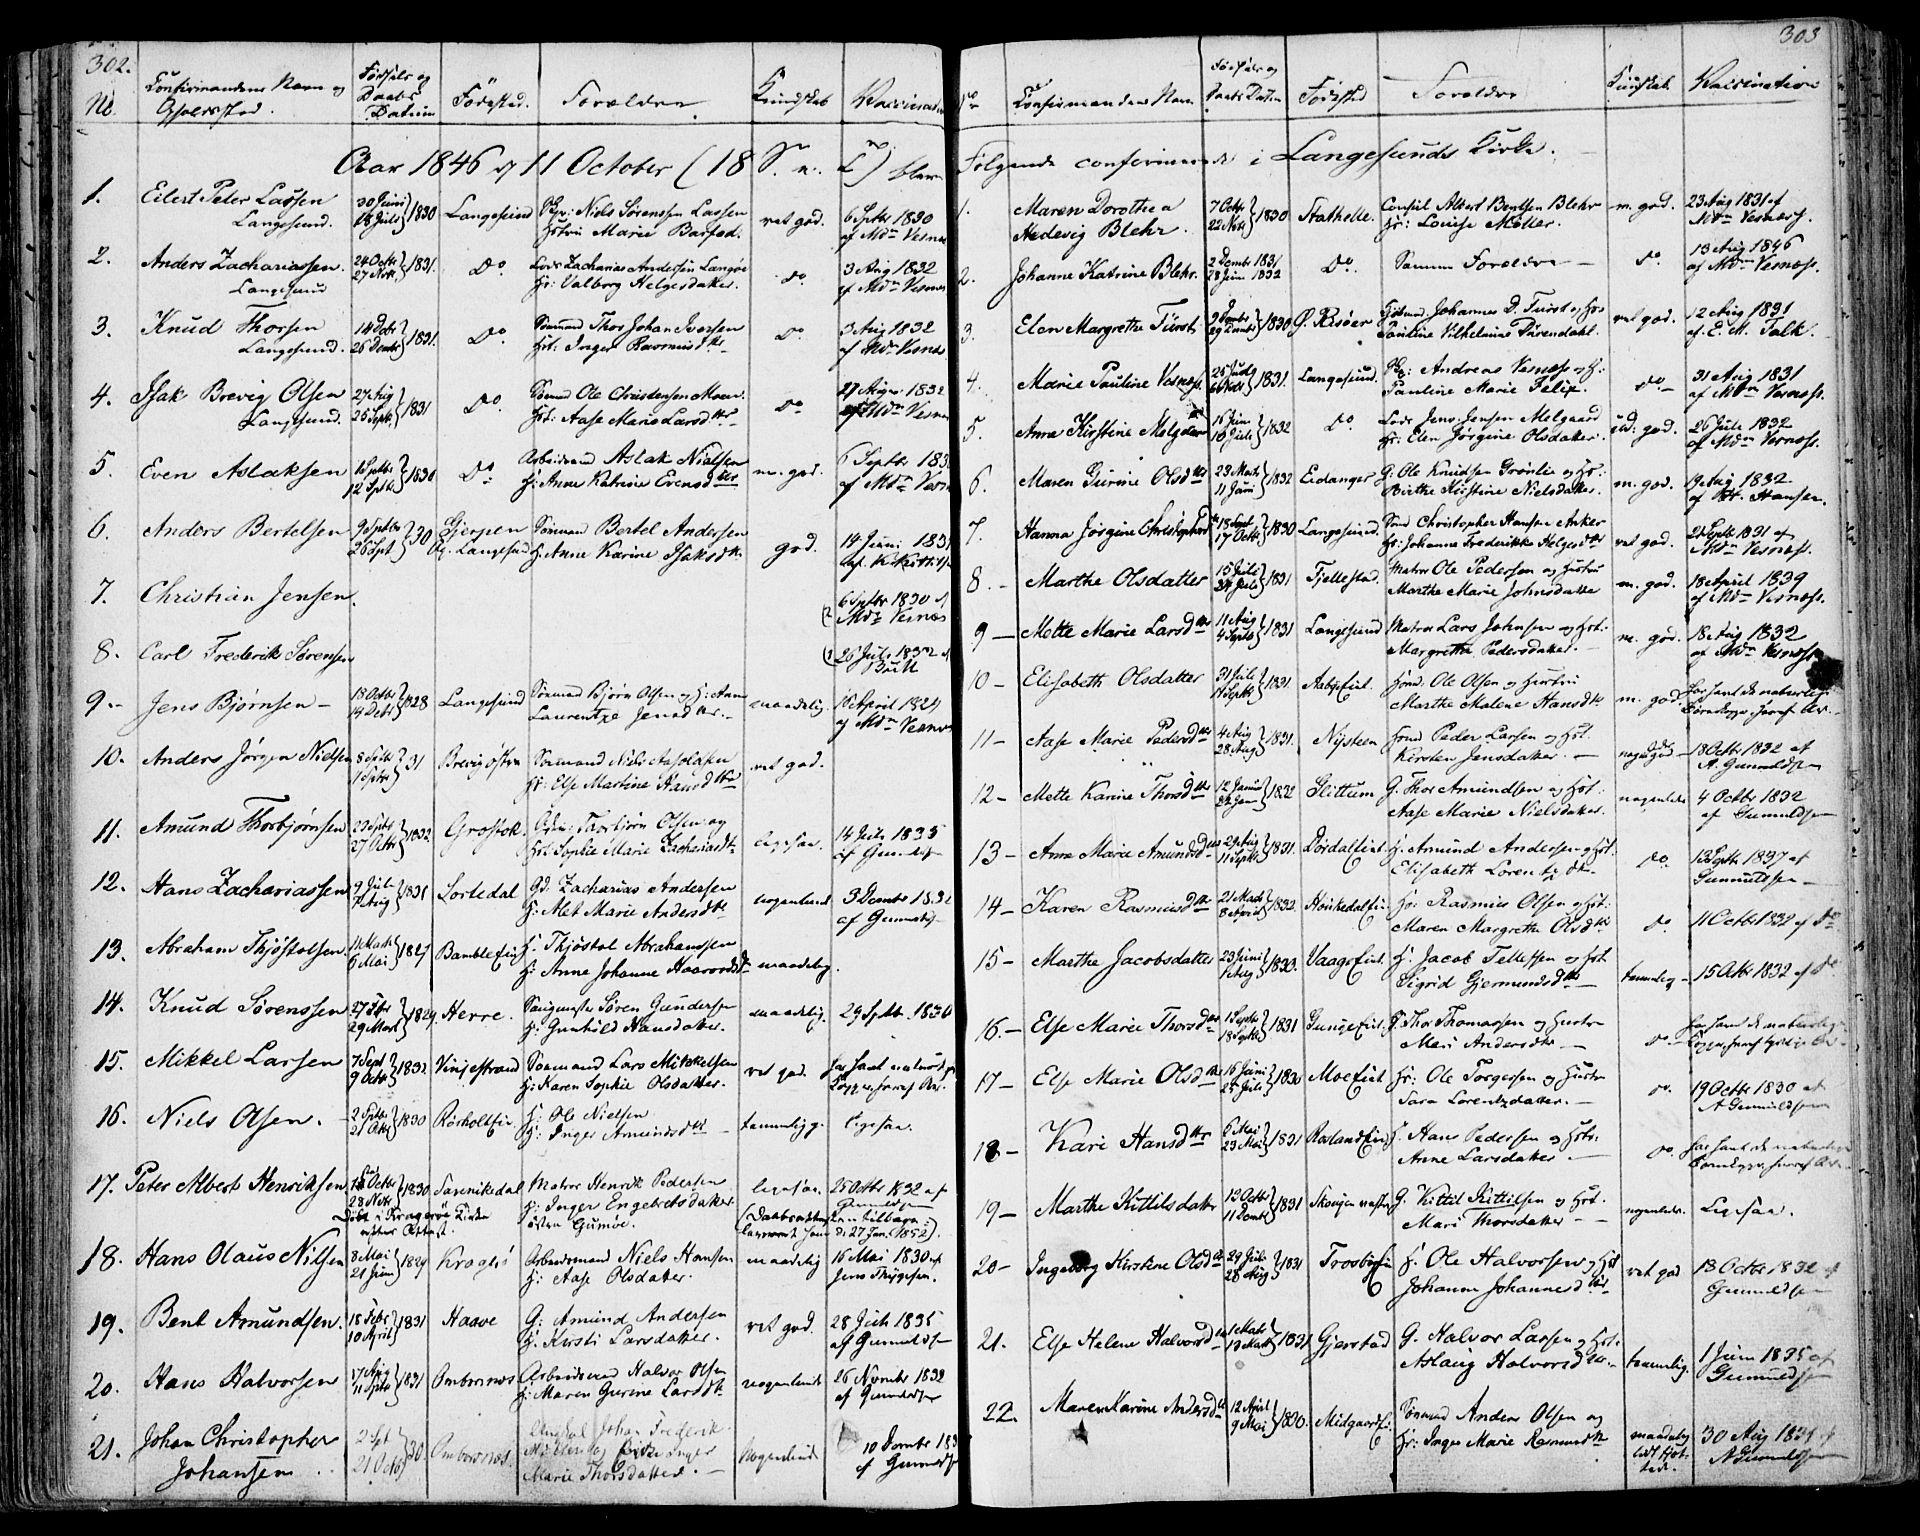 SAKO, Bamble kirkebøker, F/Fa/L0004: Ministerialbok nr. I 4, 1834-1853, s. 302-303